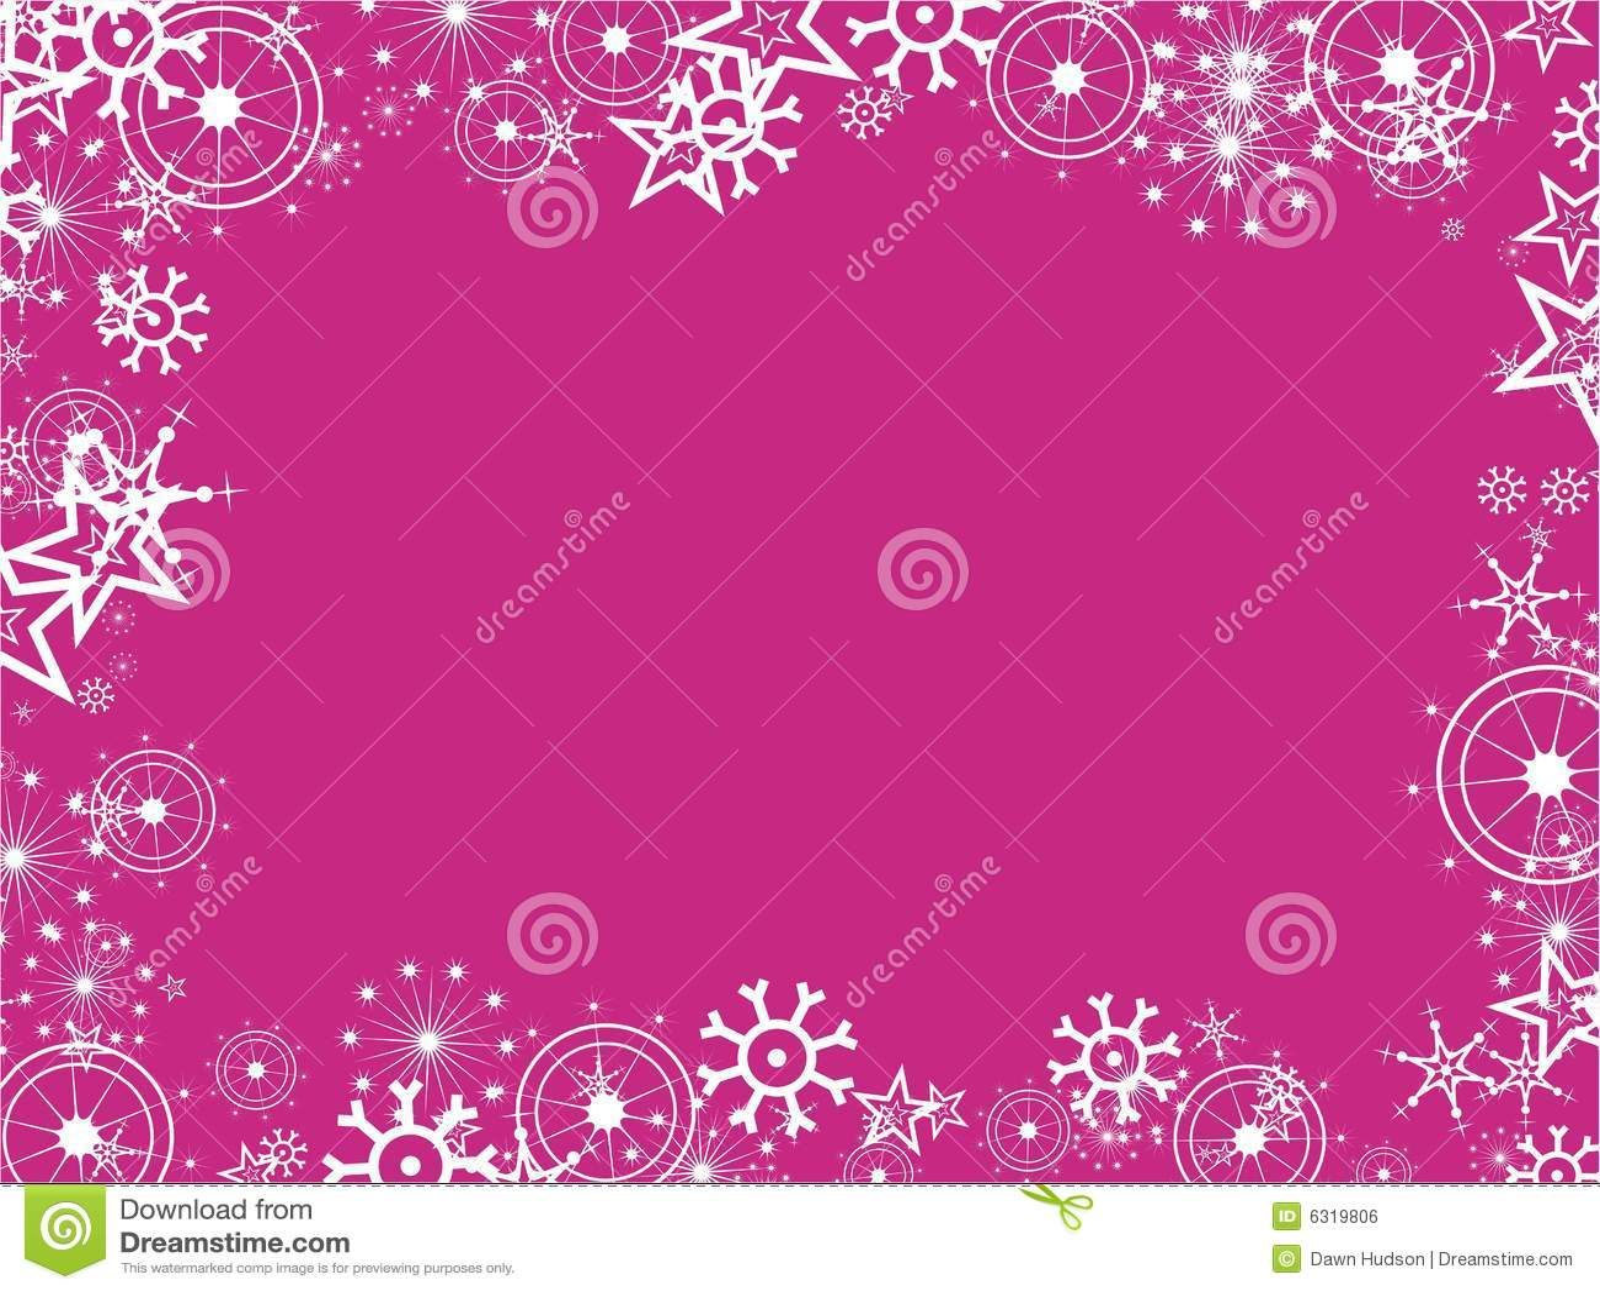 Snowflake Border Royalty Free Stock Image - Image: 6319806